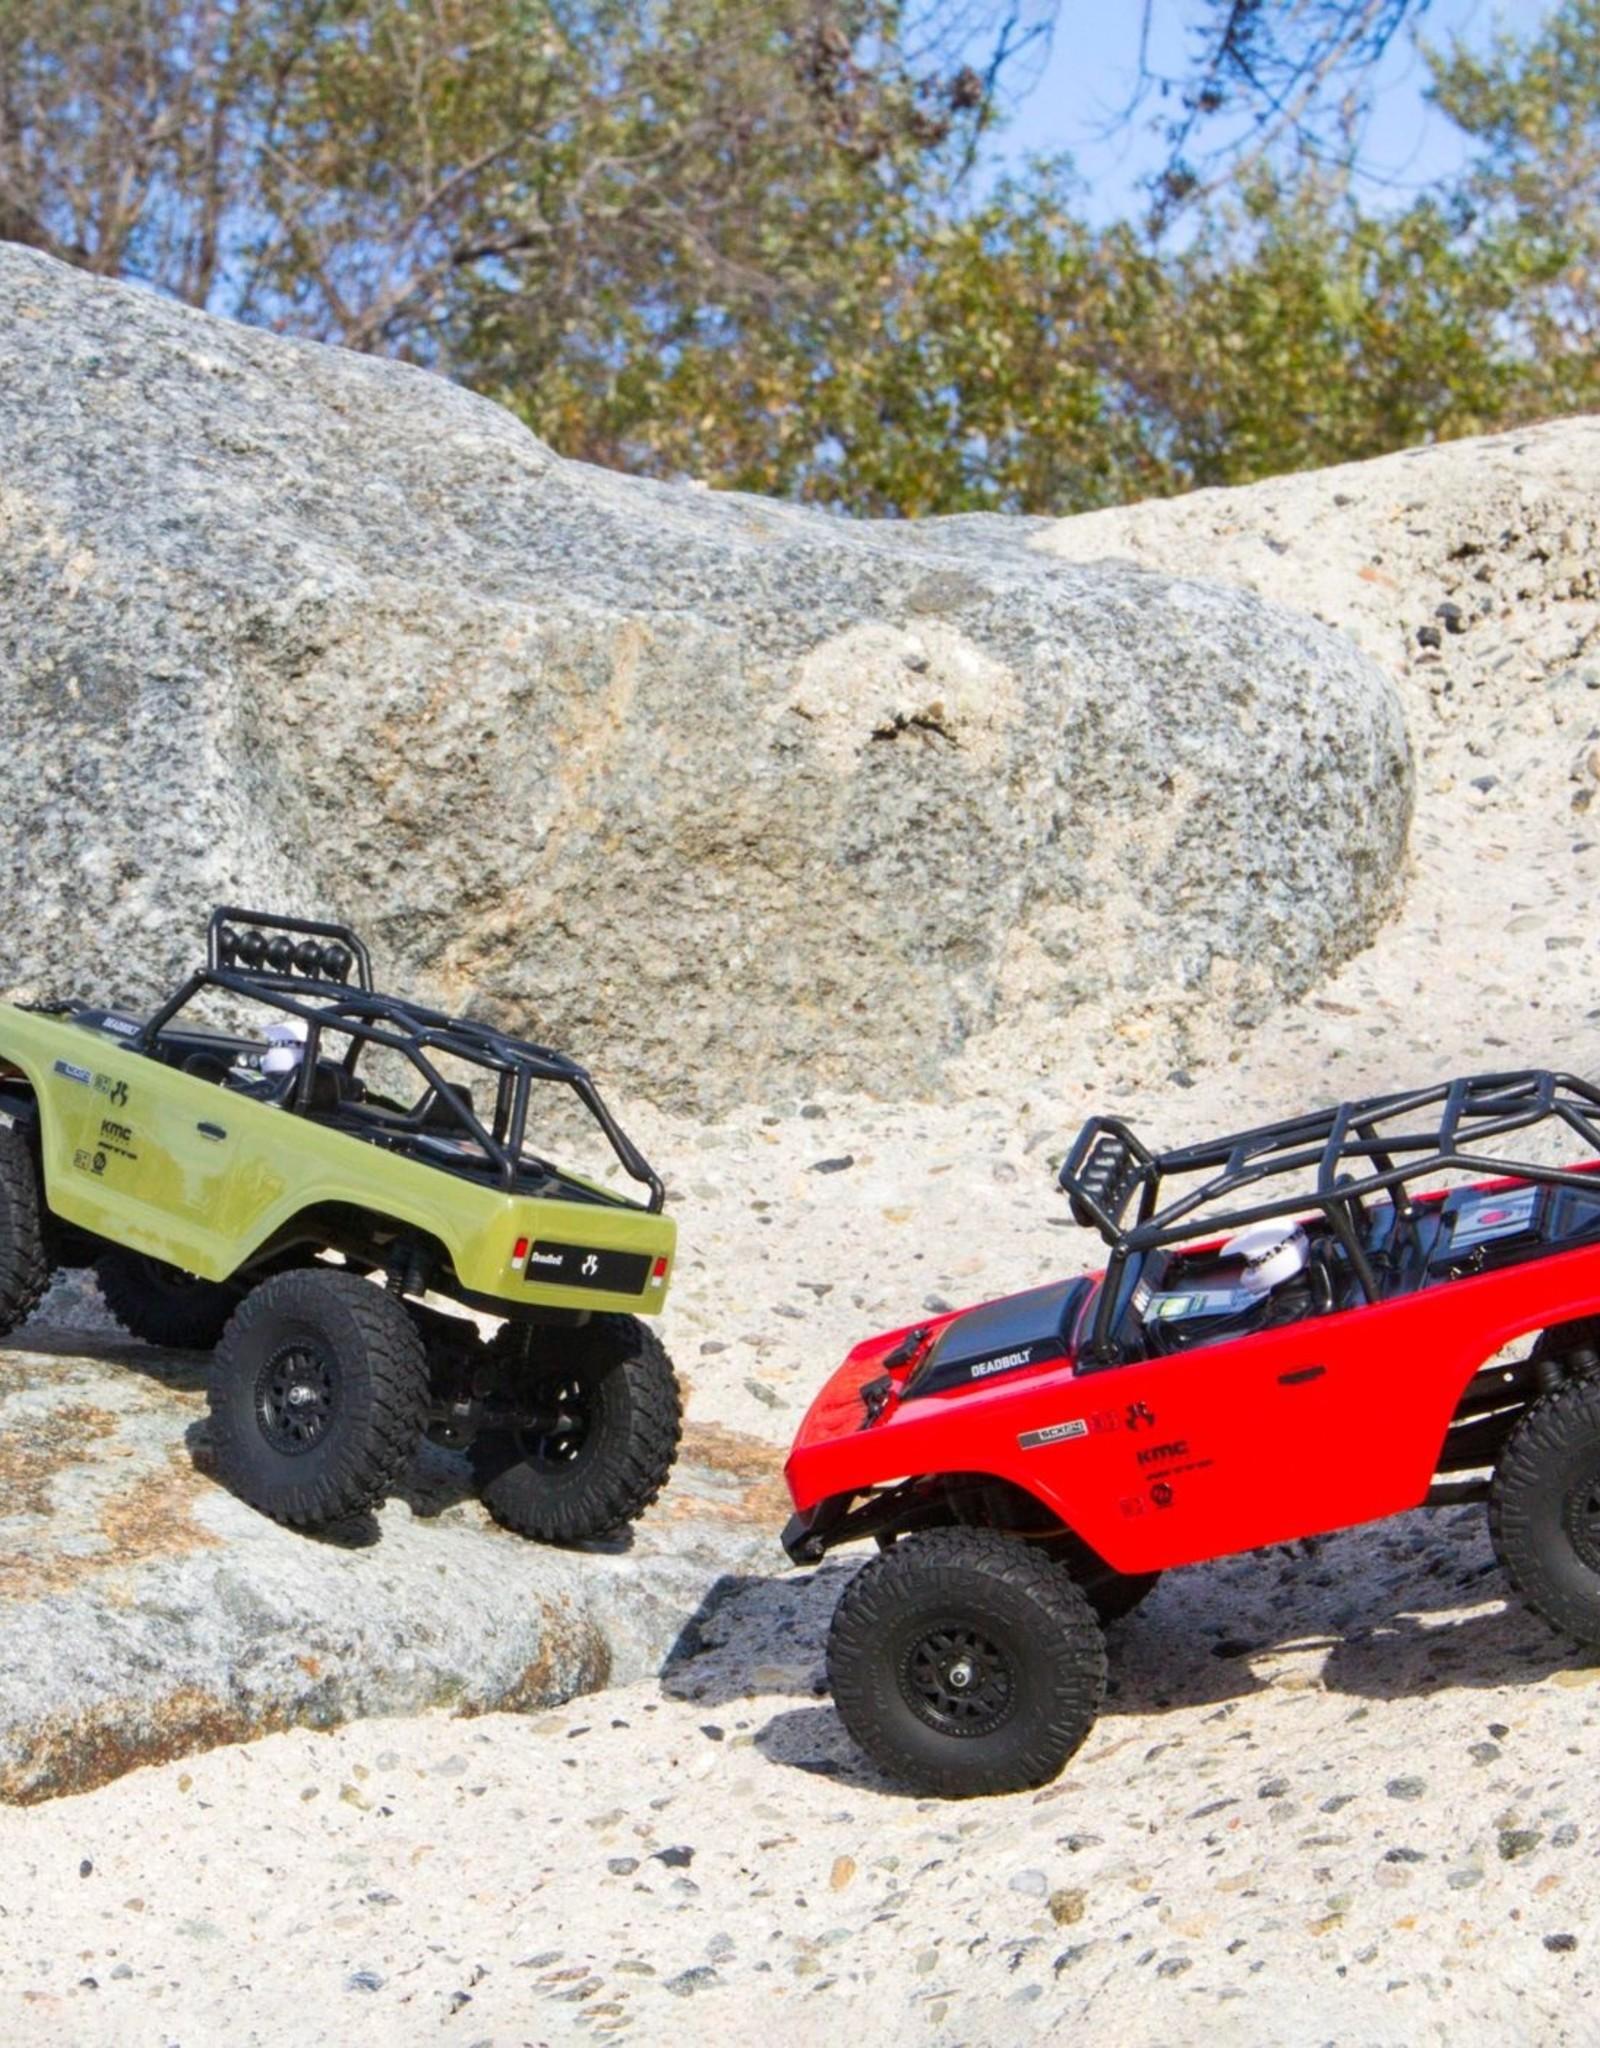 Axial Axial 1/24 SCX24 Deadbolt 4WD Rock Crawler Brushed RTR, Green